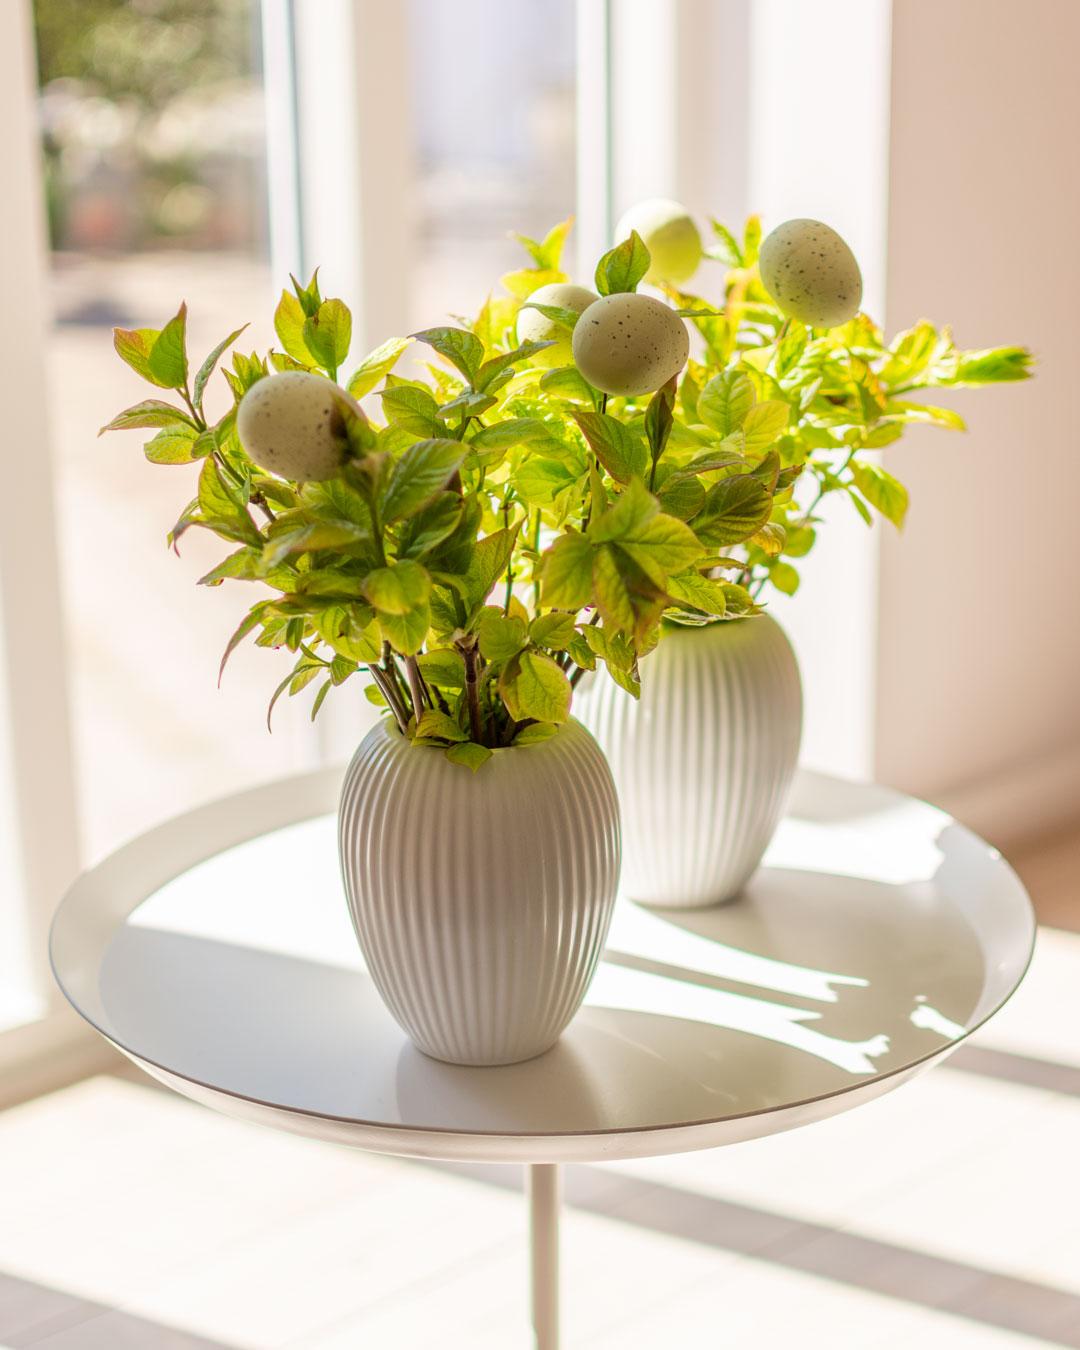 To små hvide vaser fra Michael Andersen Keramik Model 4767 med grene og påskeæg på lille hvidt bord